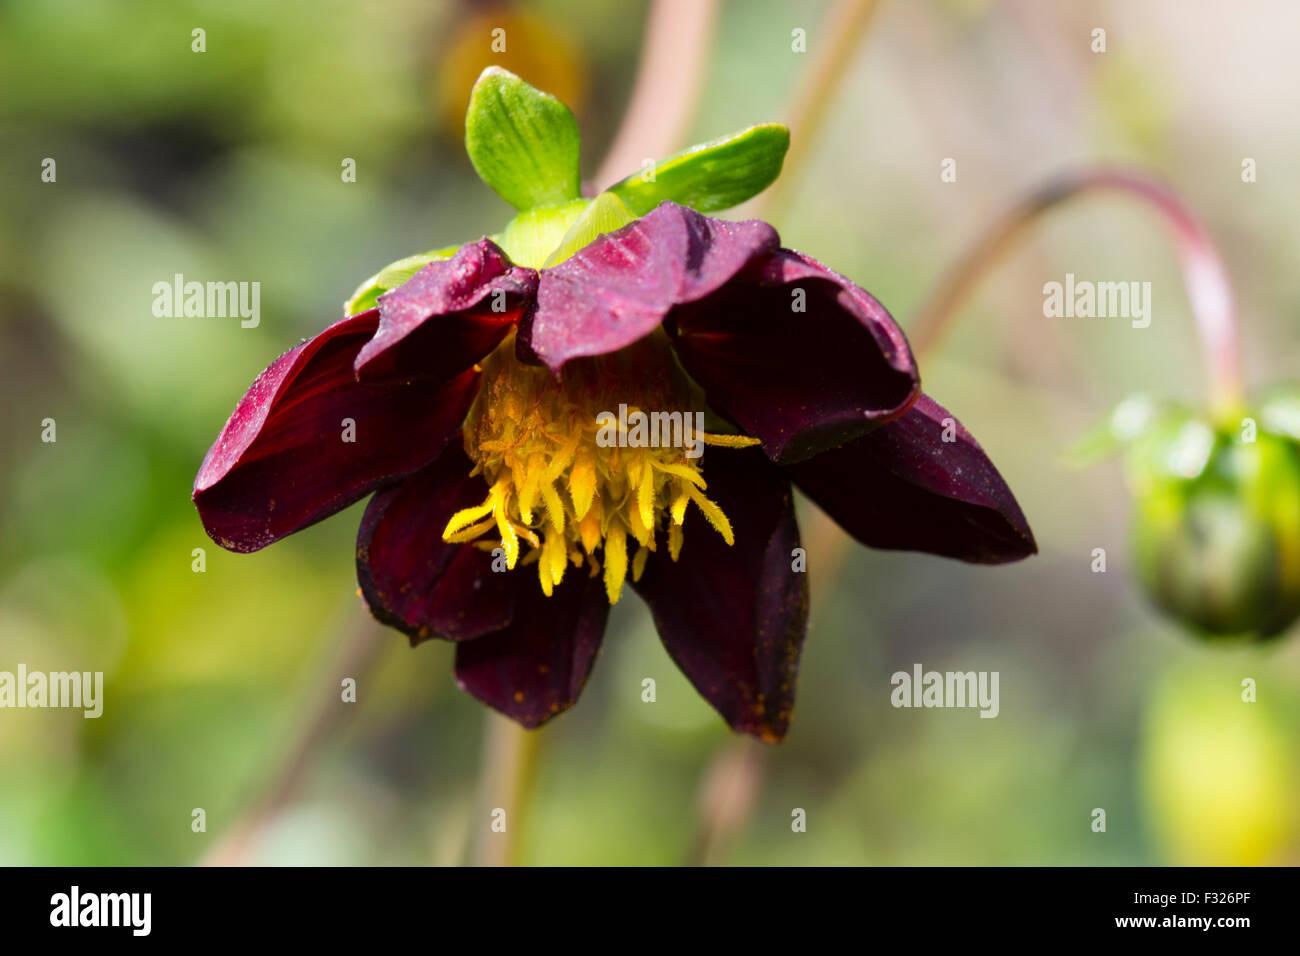 Nodding September flower of a natural hybrid, Dahlia x Cosmos 'Mexican Black' - Stock Image